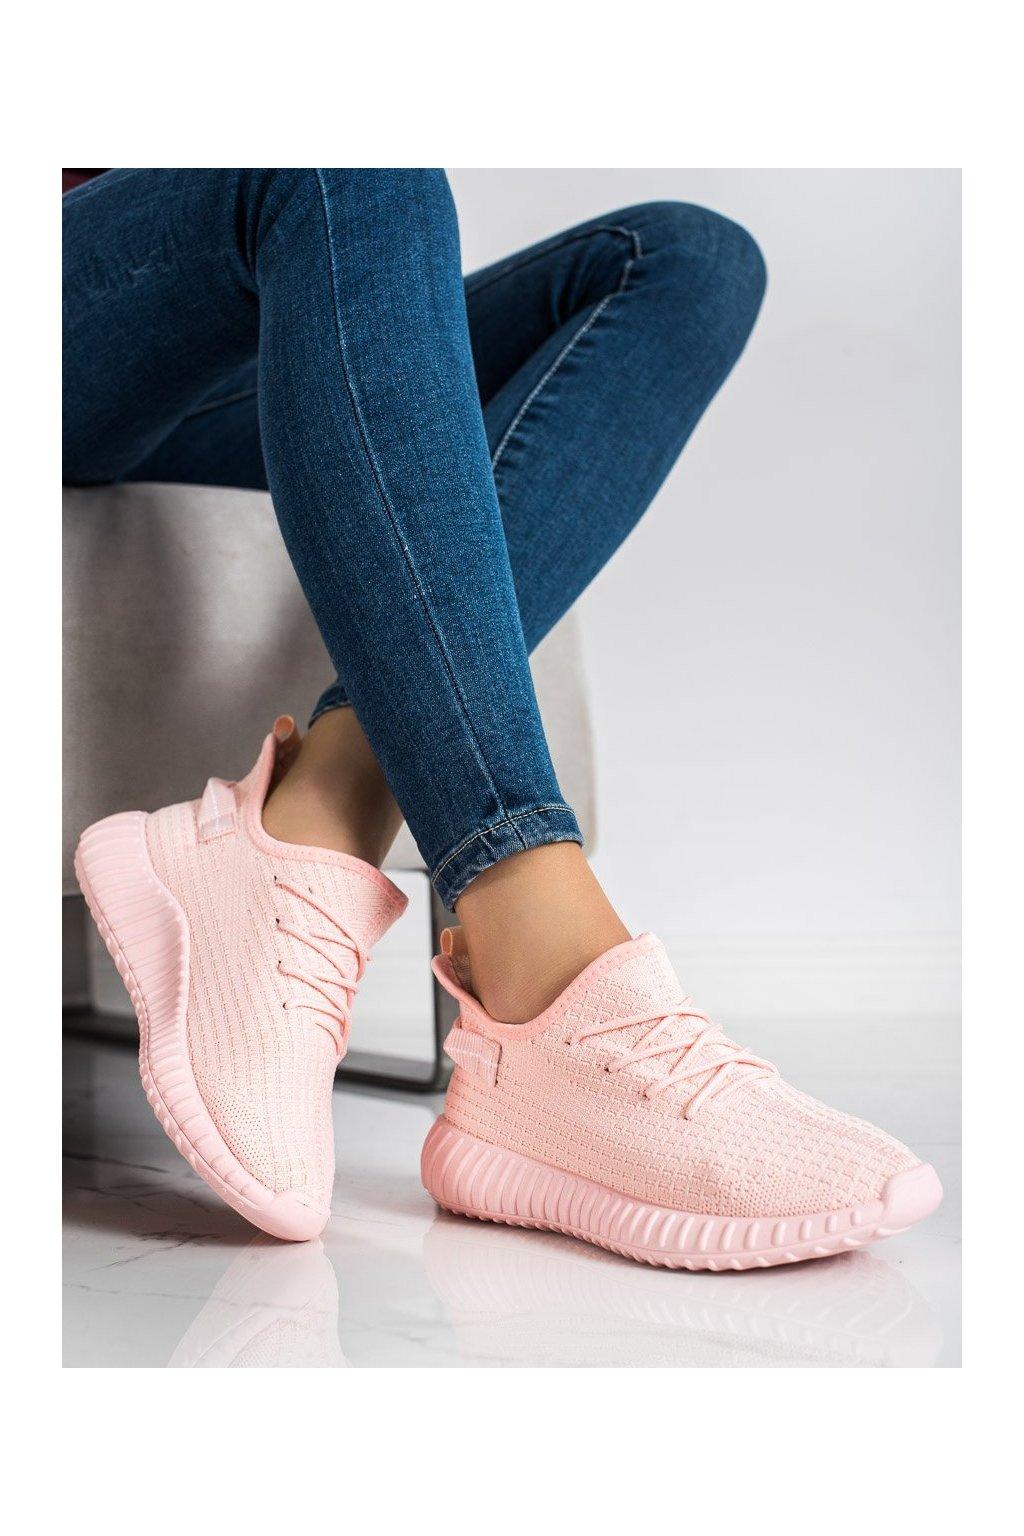 Ružové tenisky Marquiz kod 7817P